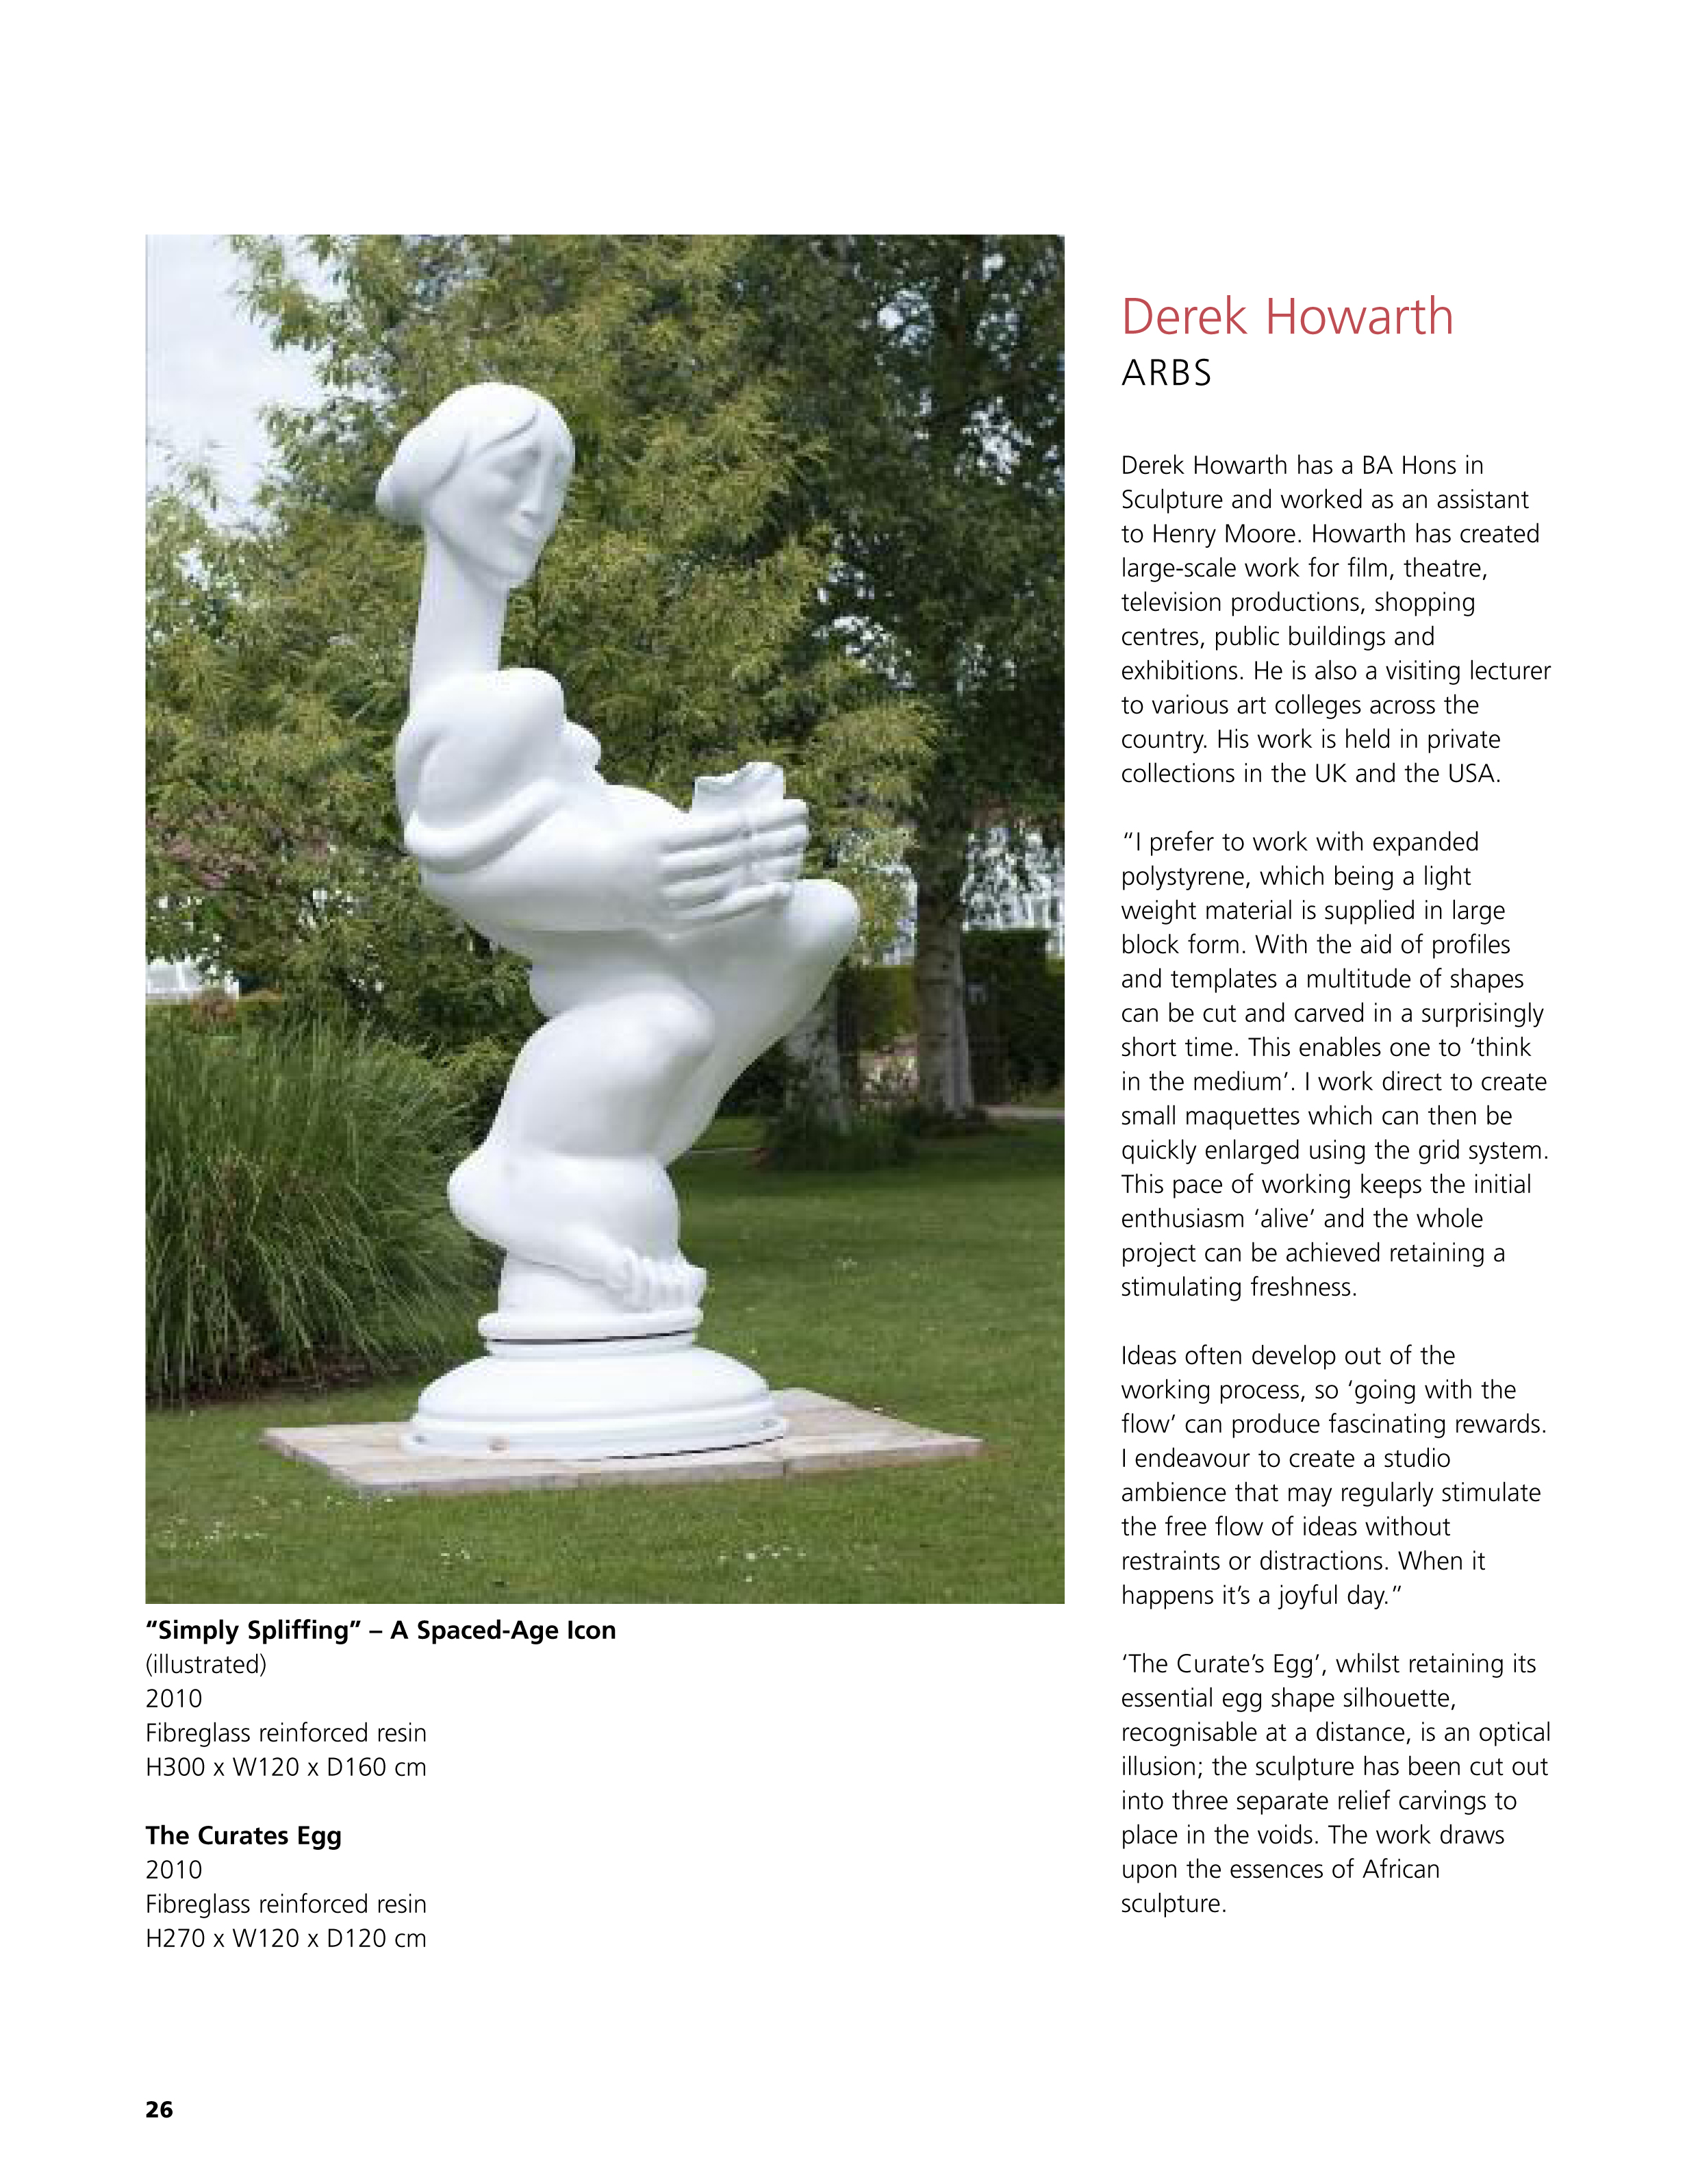 sculpturebooklet 2010 Leicester-26.jpg